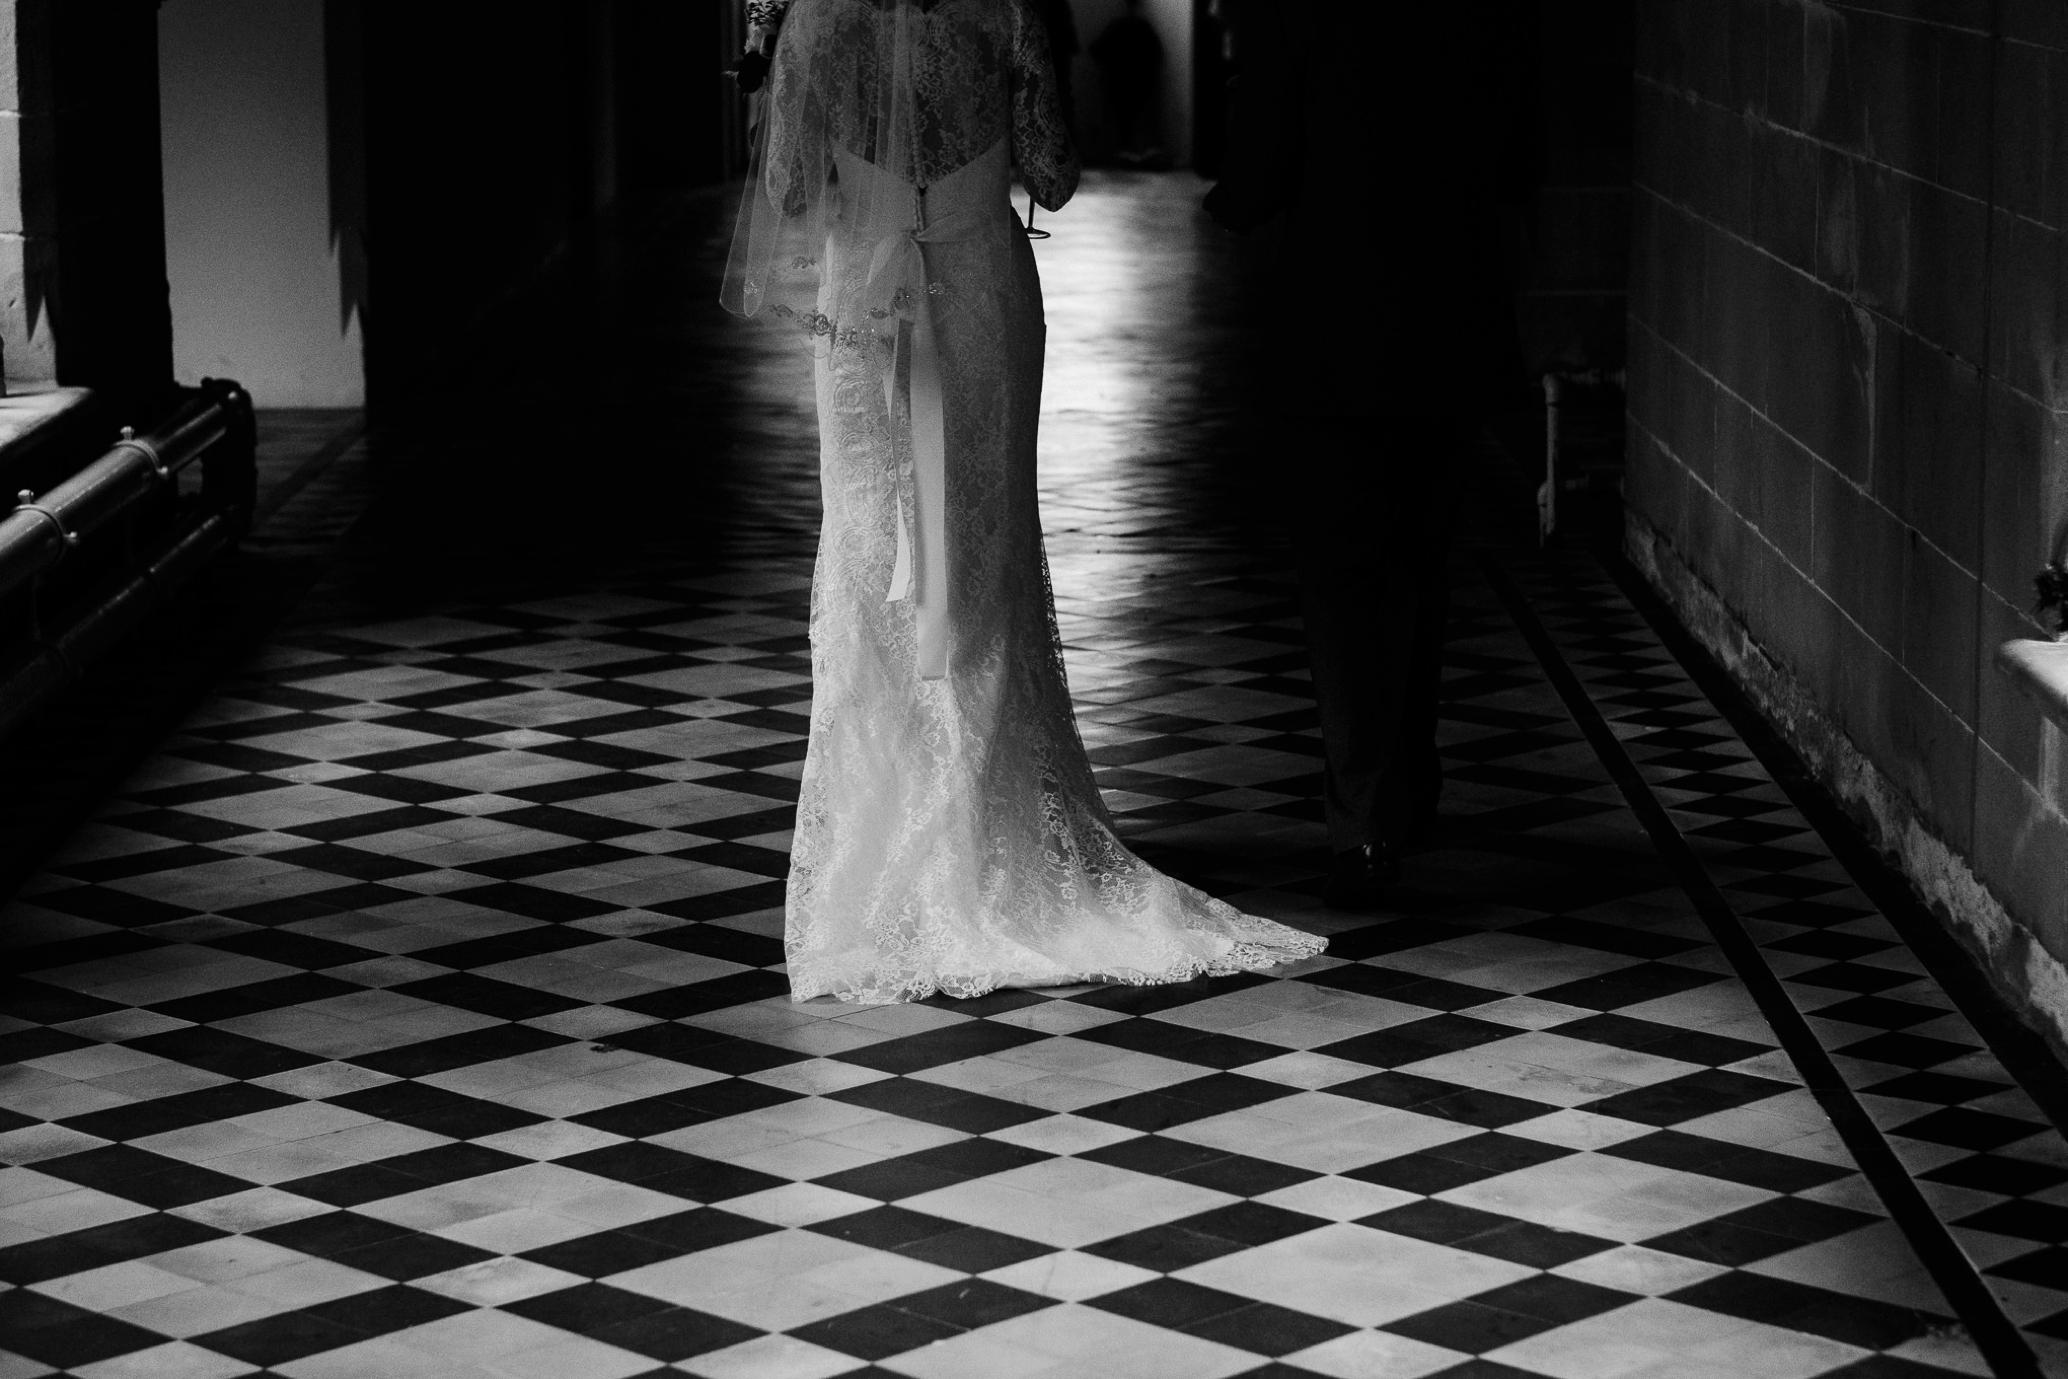 20170520_euan robertson weddings_040_WEB.jpg